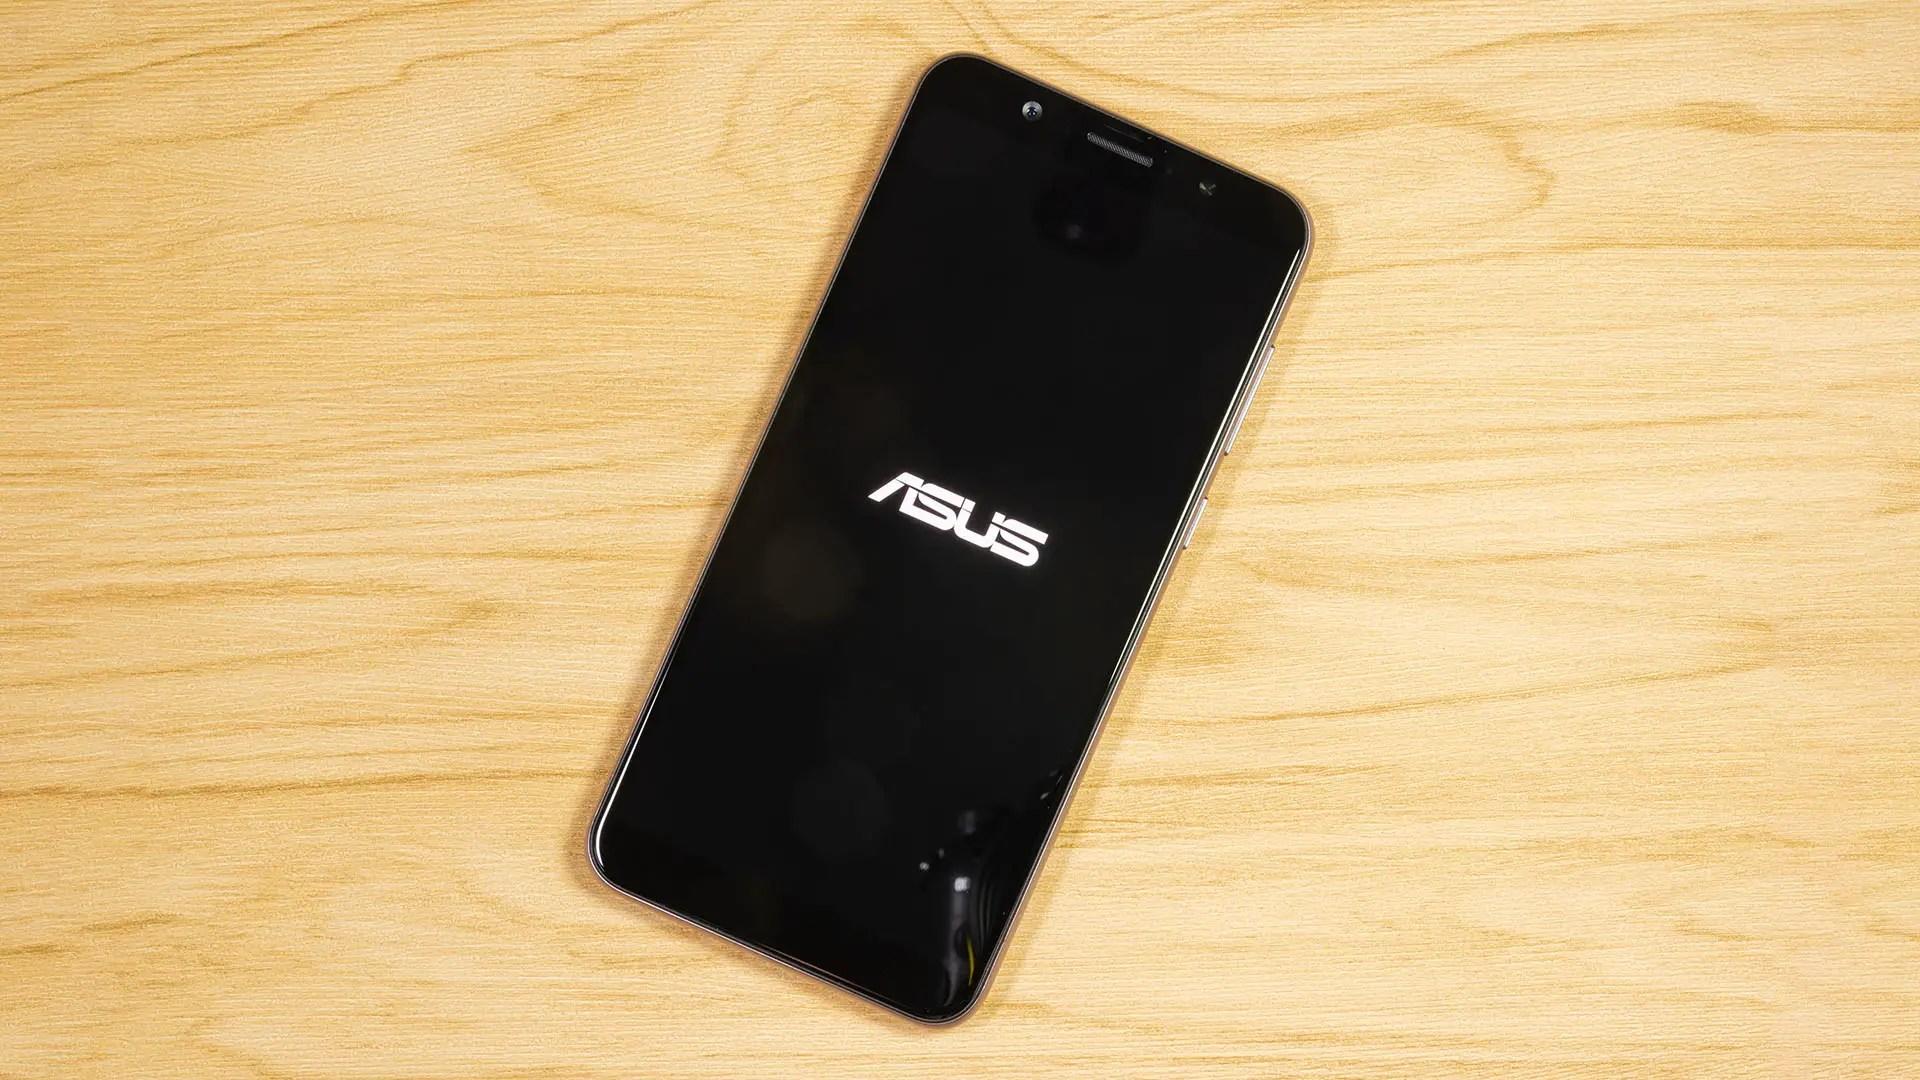 Review - ASUS ZenFone Max Pro (M1) 6GB RAM